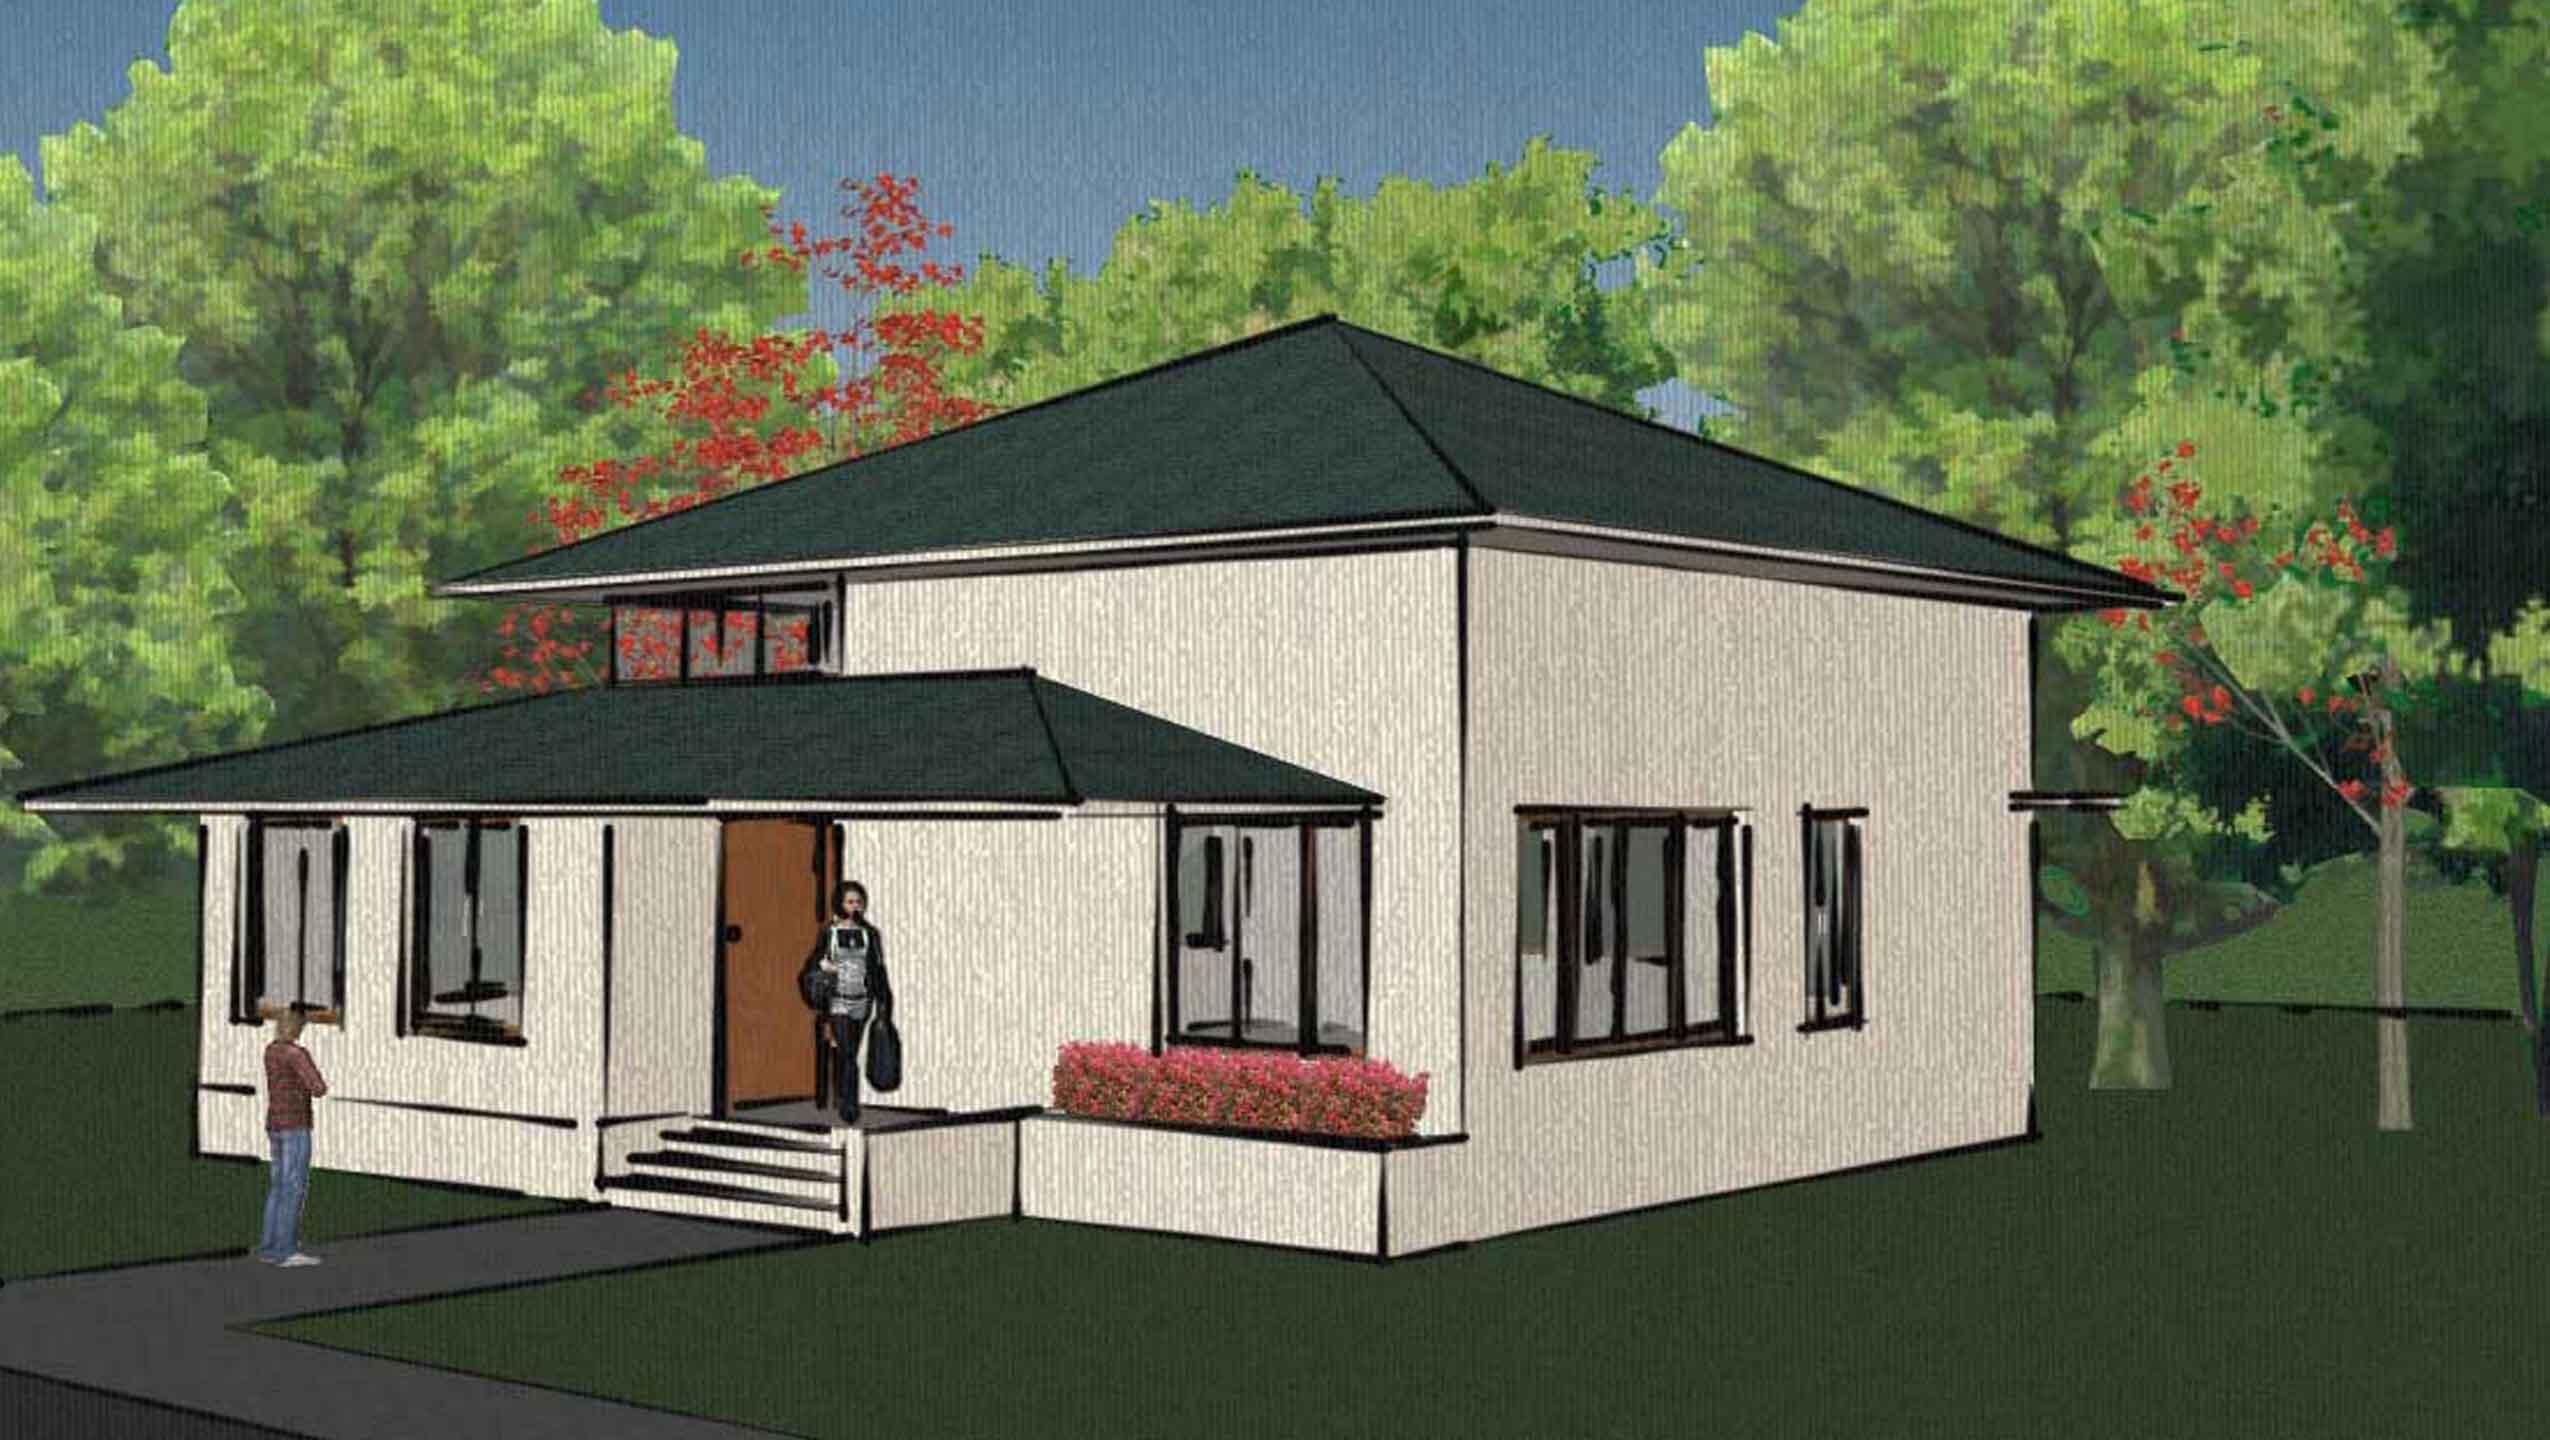 Simple Roofing Designs Kenya Home Plans Blueprints 139167